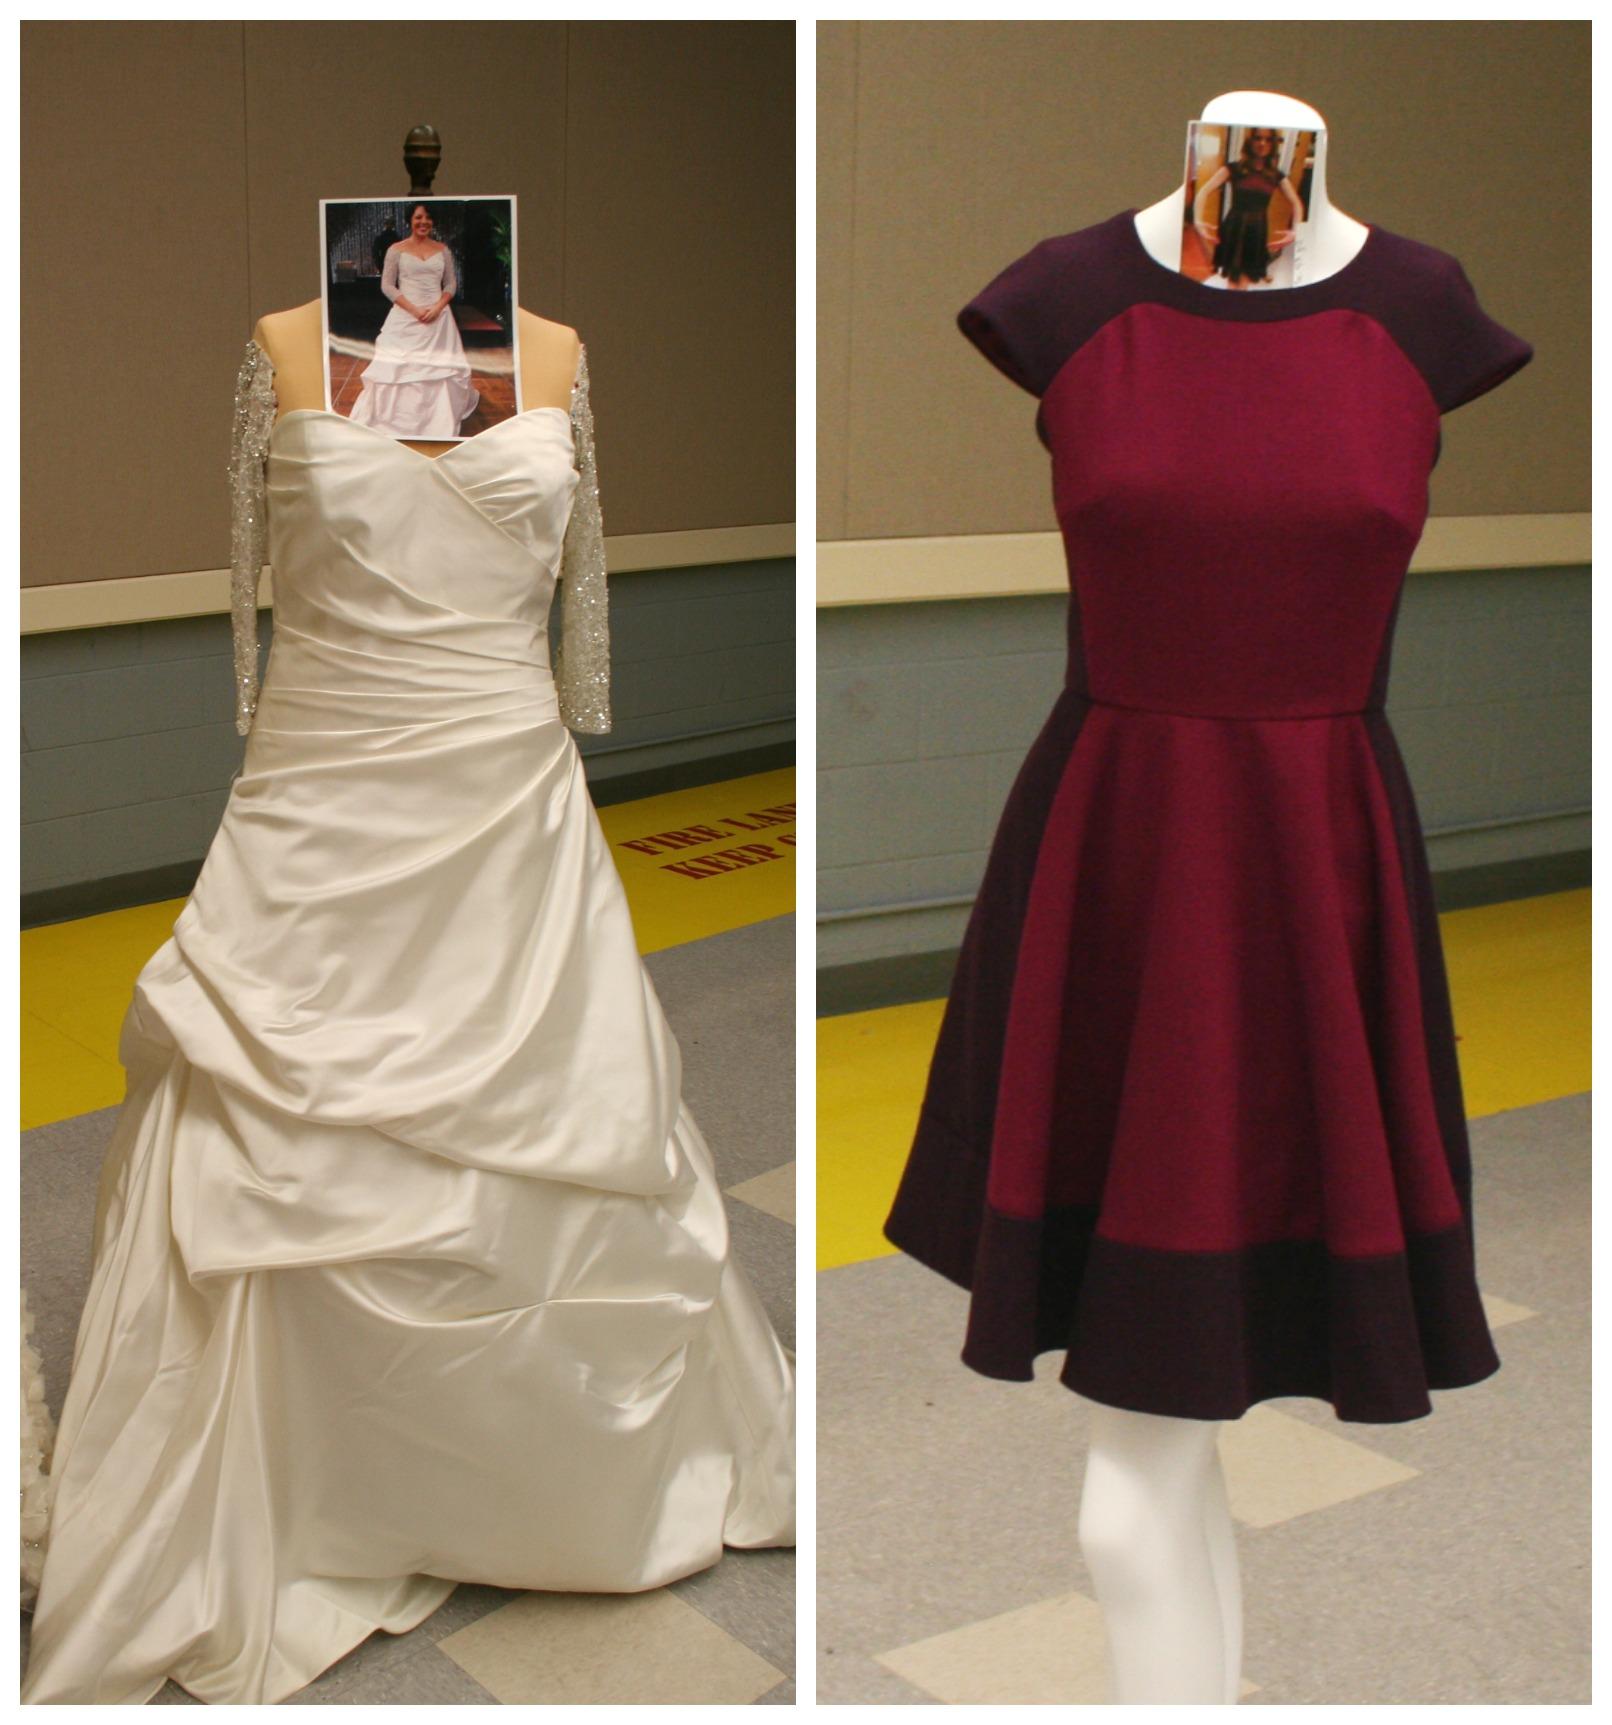 Grey's Anatomy Dresses #ABCTVEvent